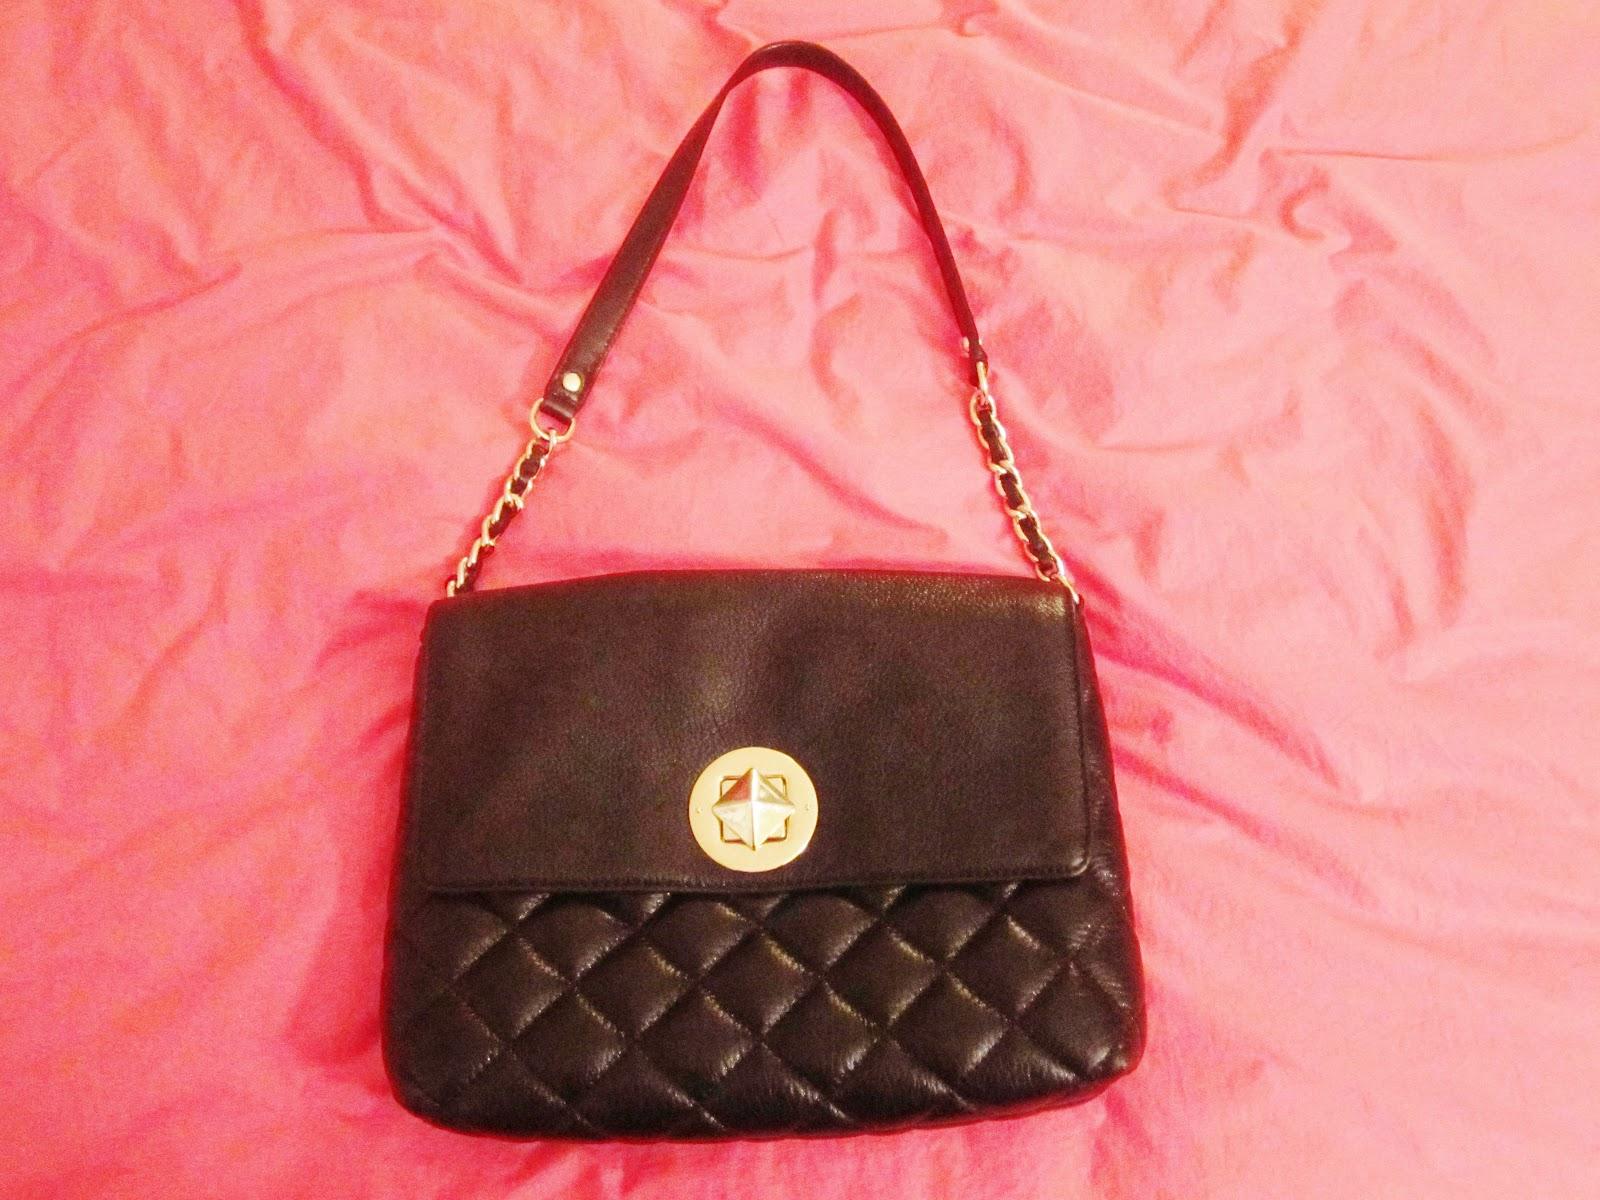 Bree Illuminated Handbags